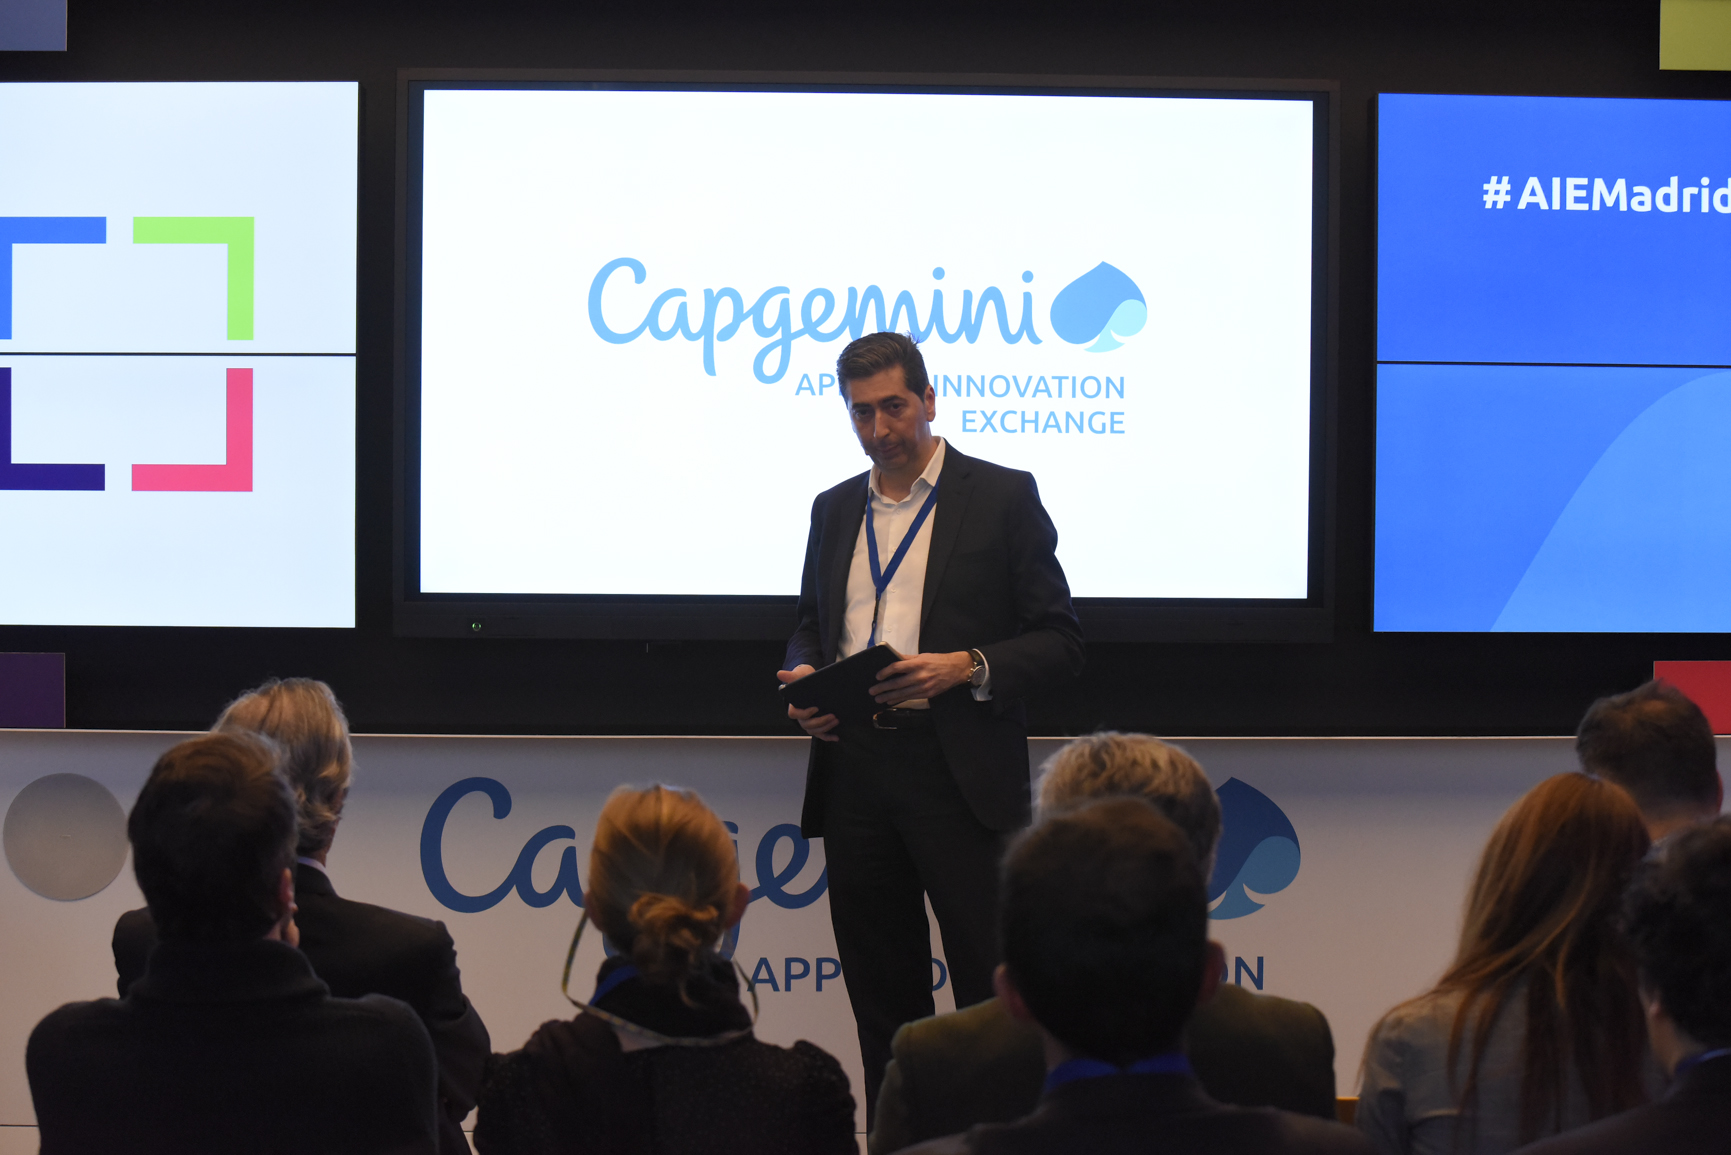 España se une a la red de centros de innovación de Capgemini